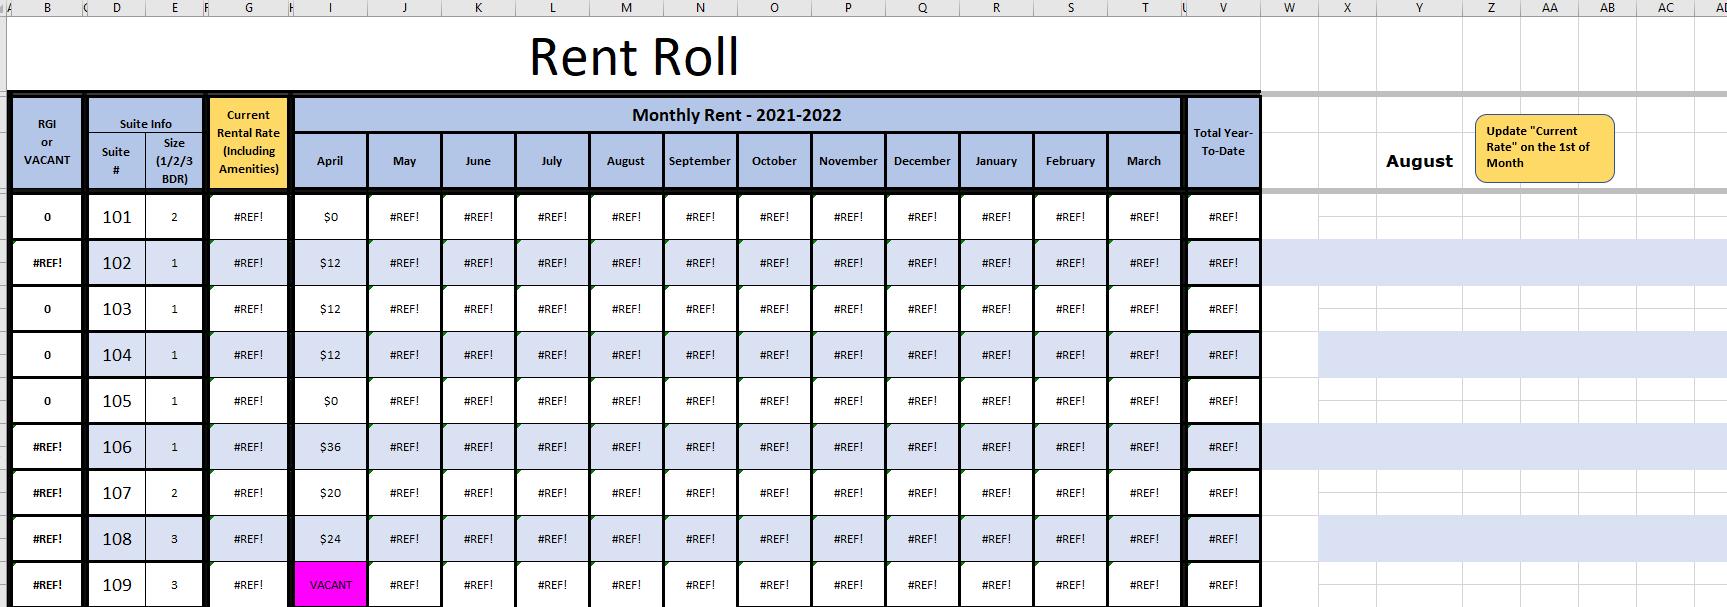 Summary Worksheet.png